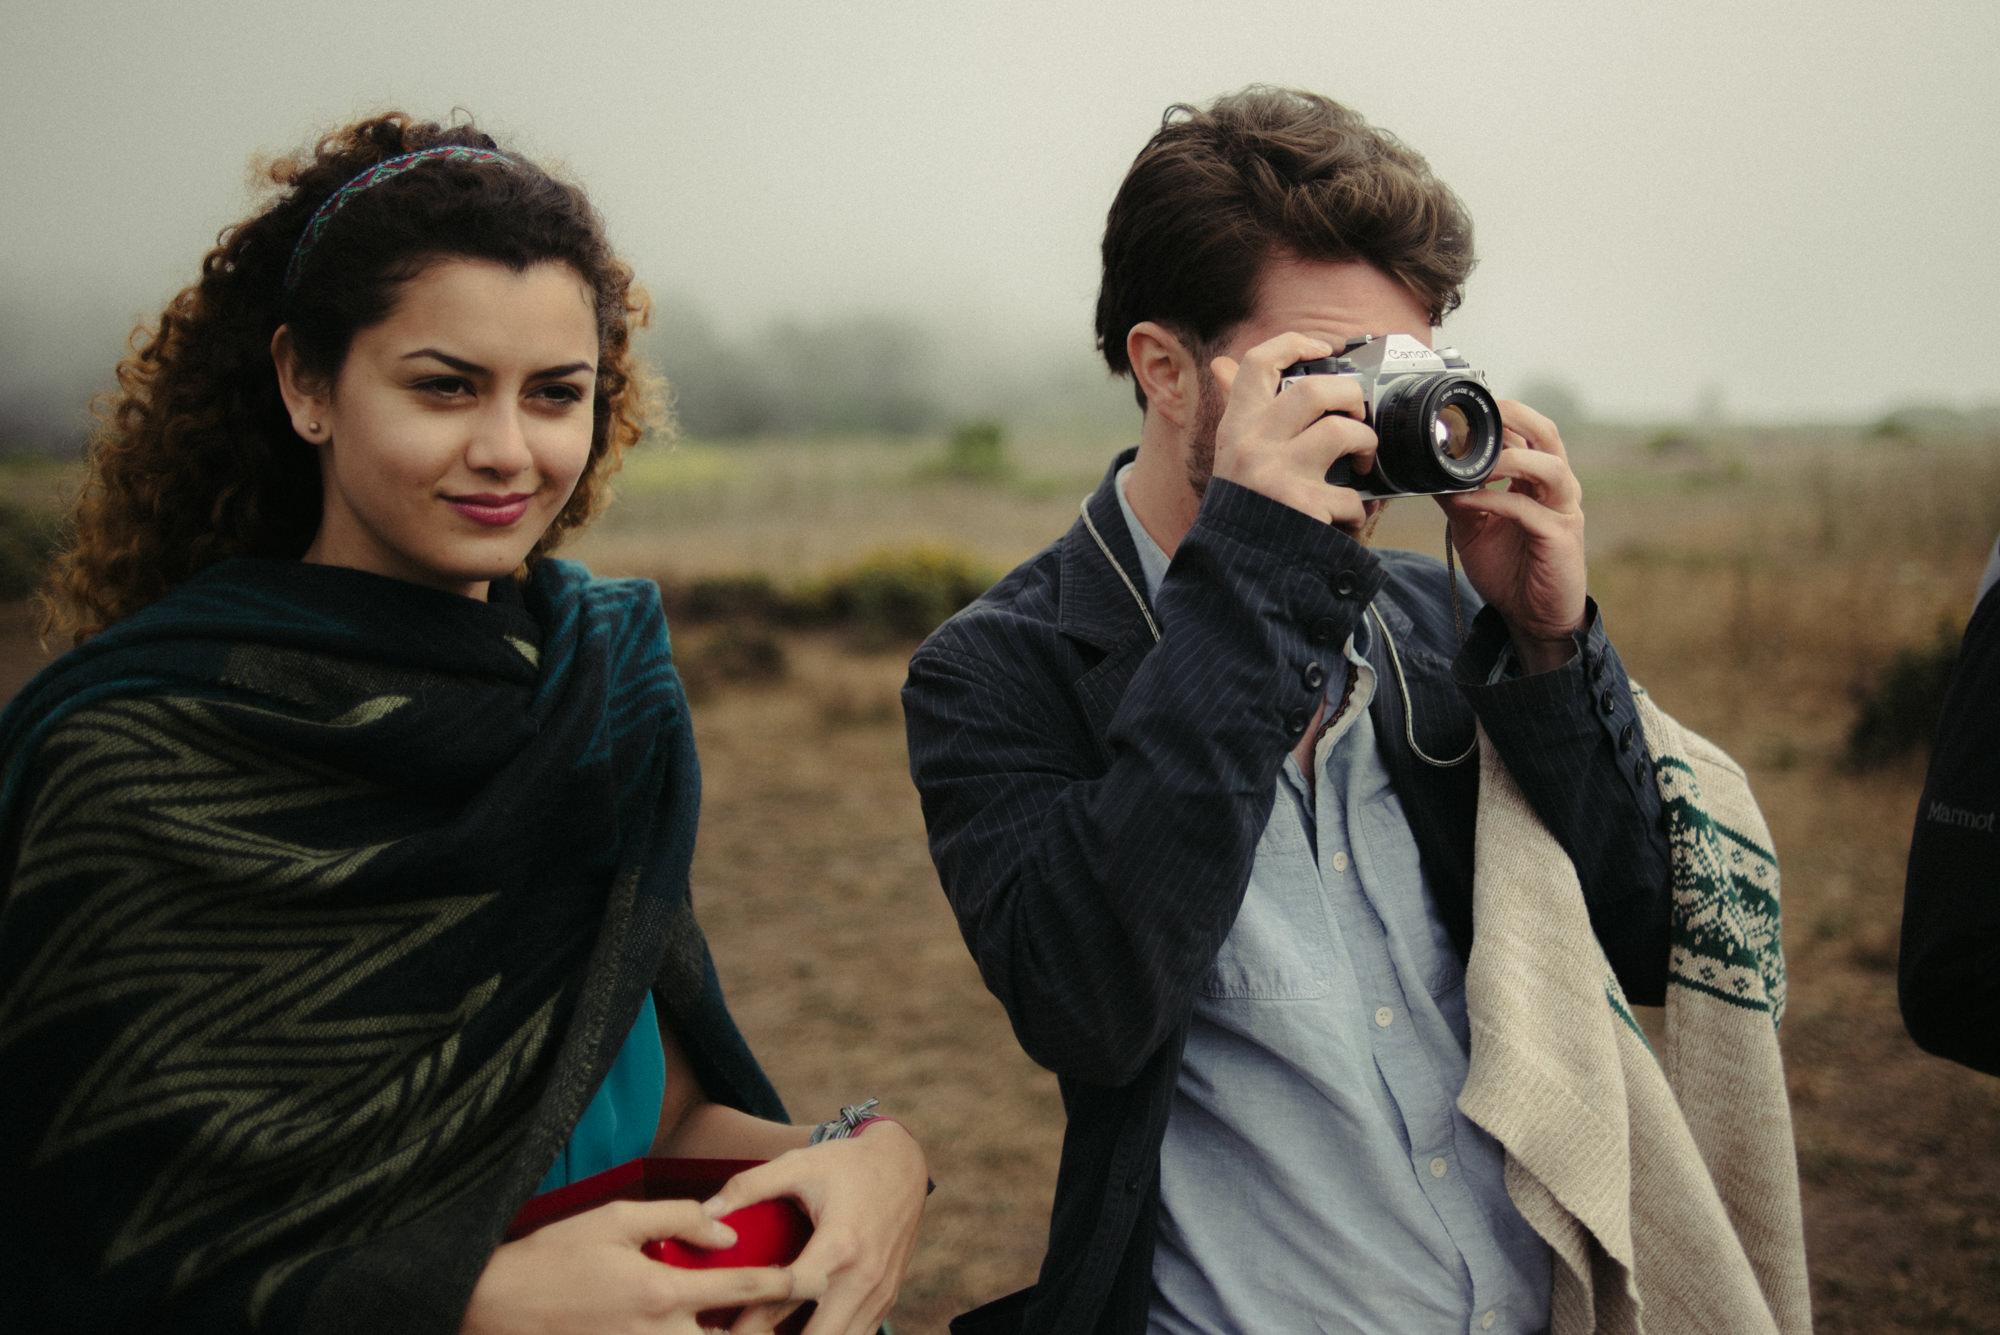 big-sur-adventure-elopement-photographer-51.jpg